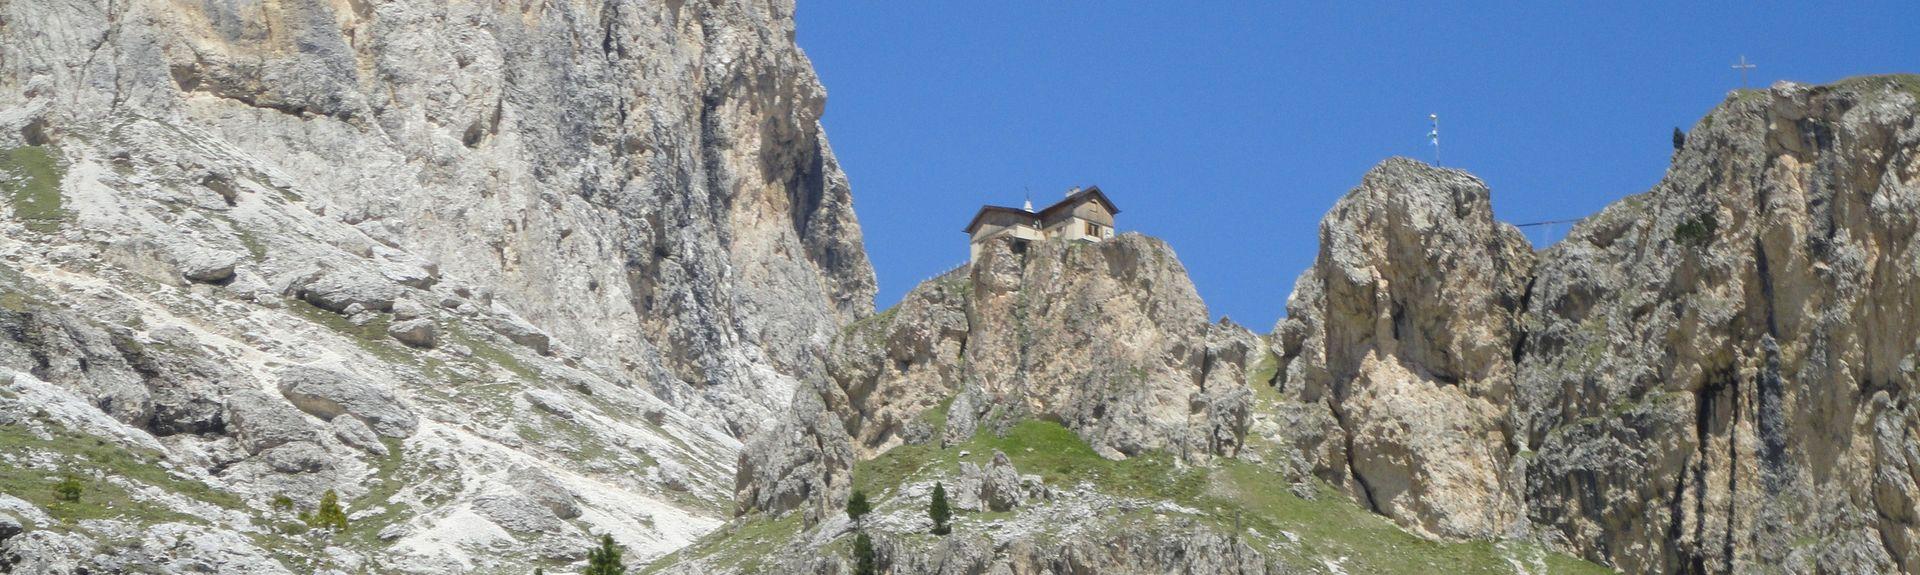 San Pellegrino Pass, Moena, Trentin-Haut-Adige, Italie